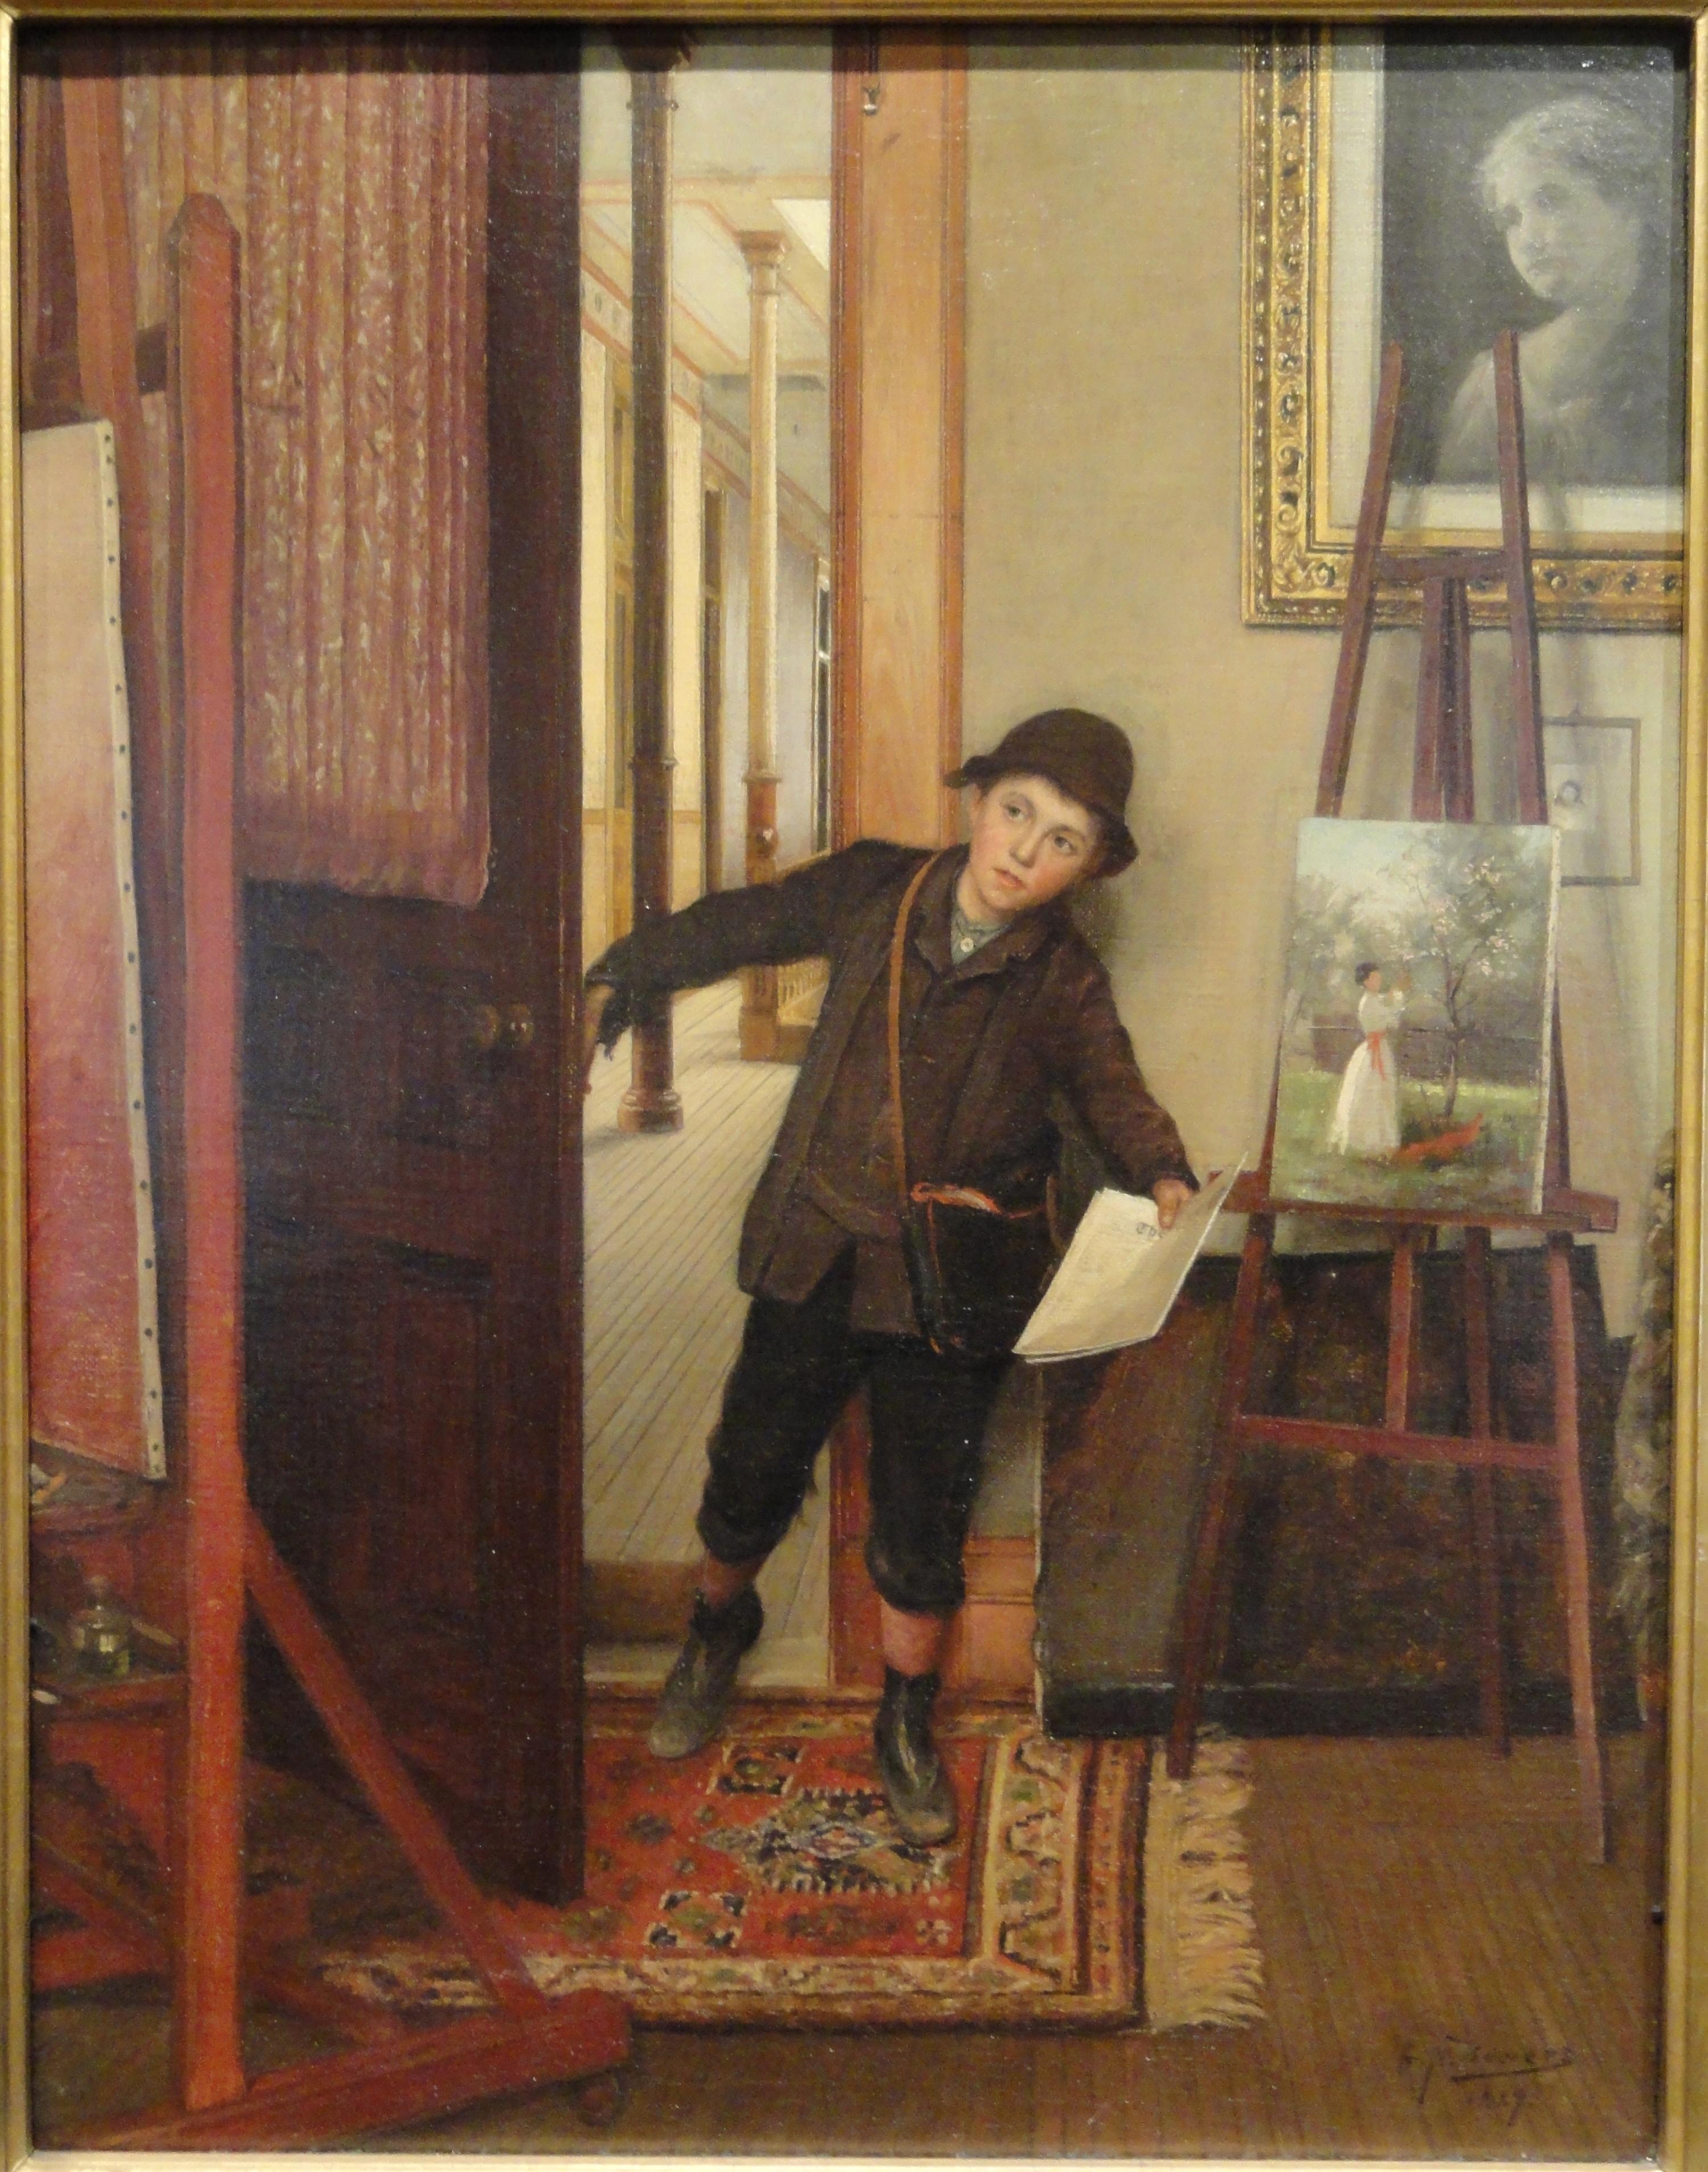 The Newsboy, George Newell Bowers, 1889